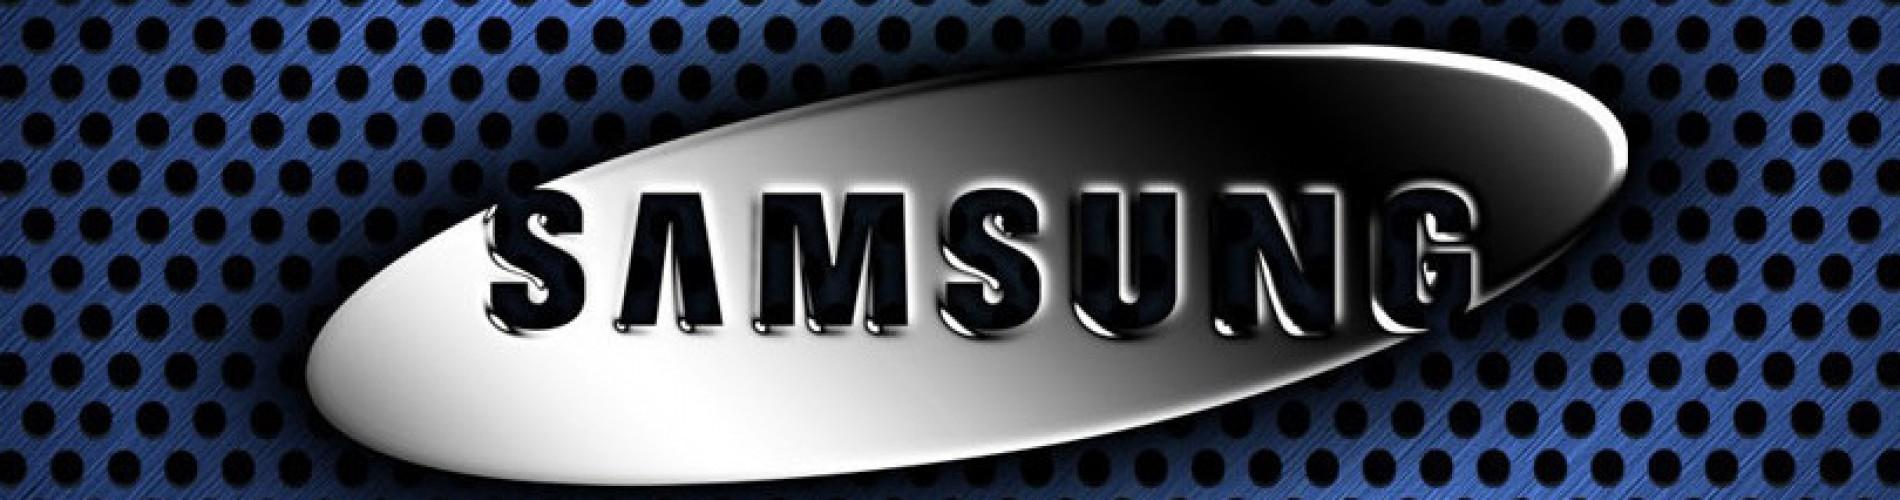 Samsung trademarks the Galaxy S6 Edge Plus